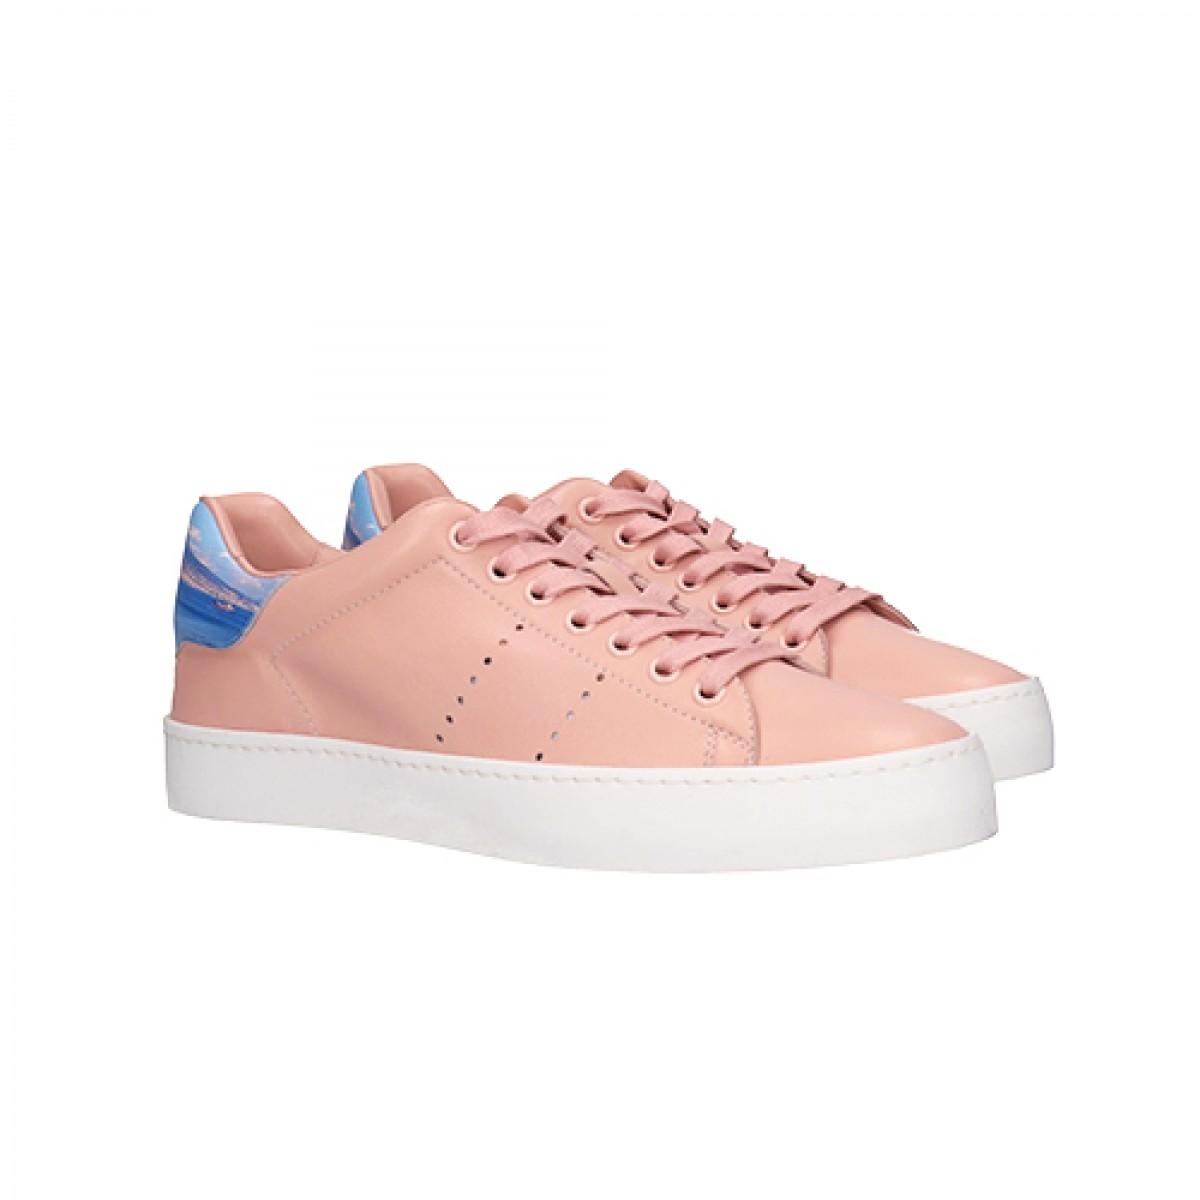 Napoli sneaker donna